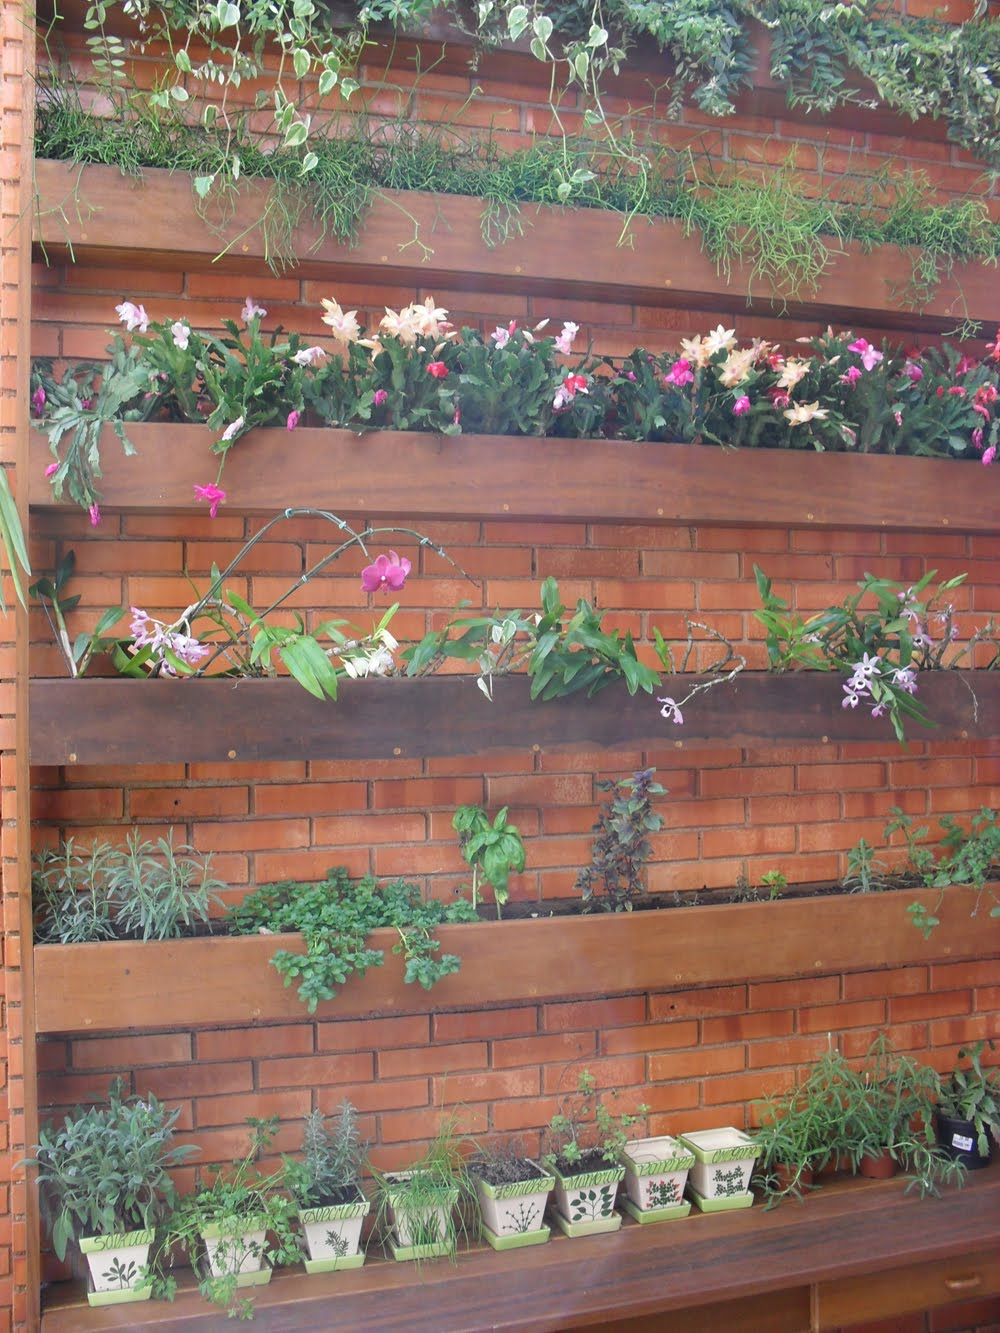 grades madeira jardim:Madearte: Jardim suspenso em Itaúba.